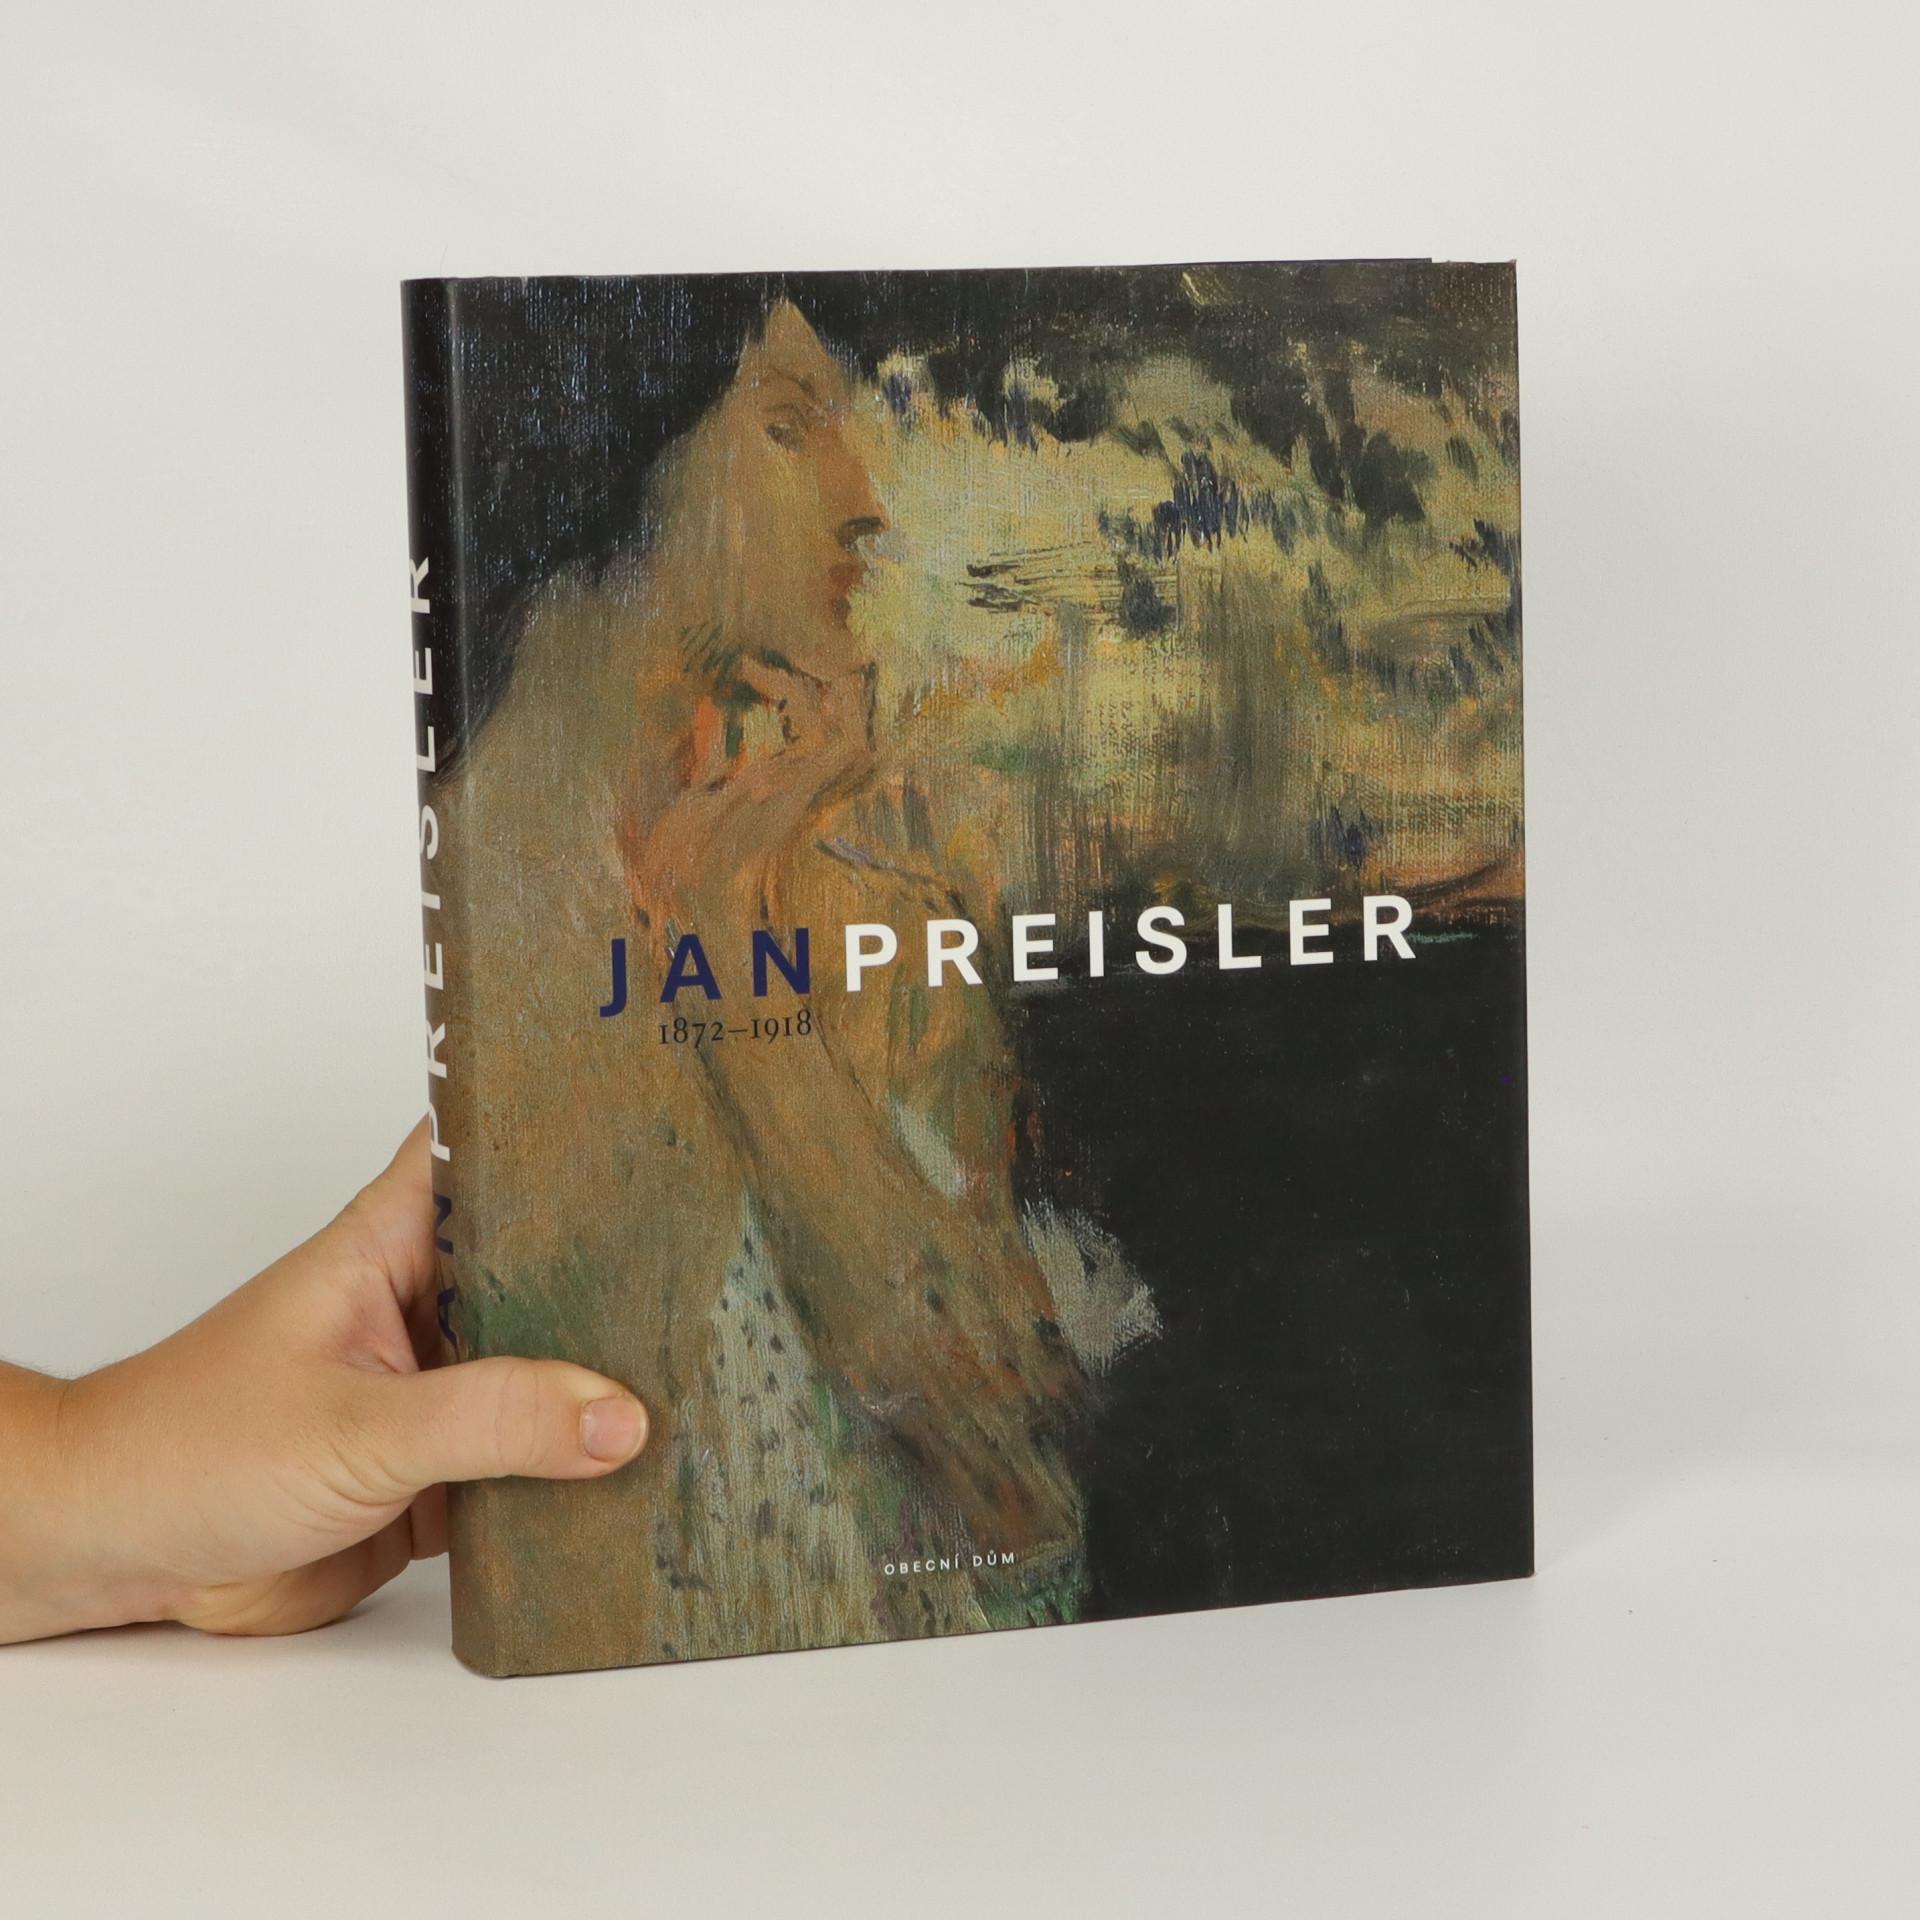 antikvární kniha Jan Preisler 1872-1918, 2003